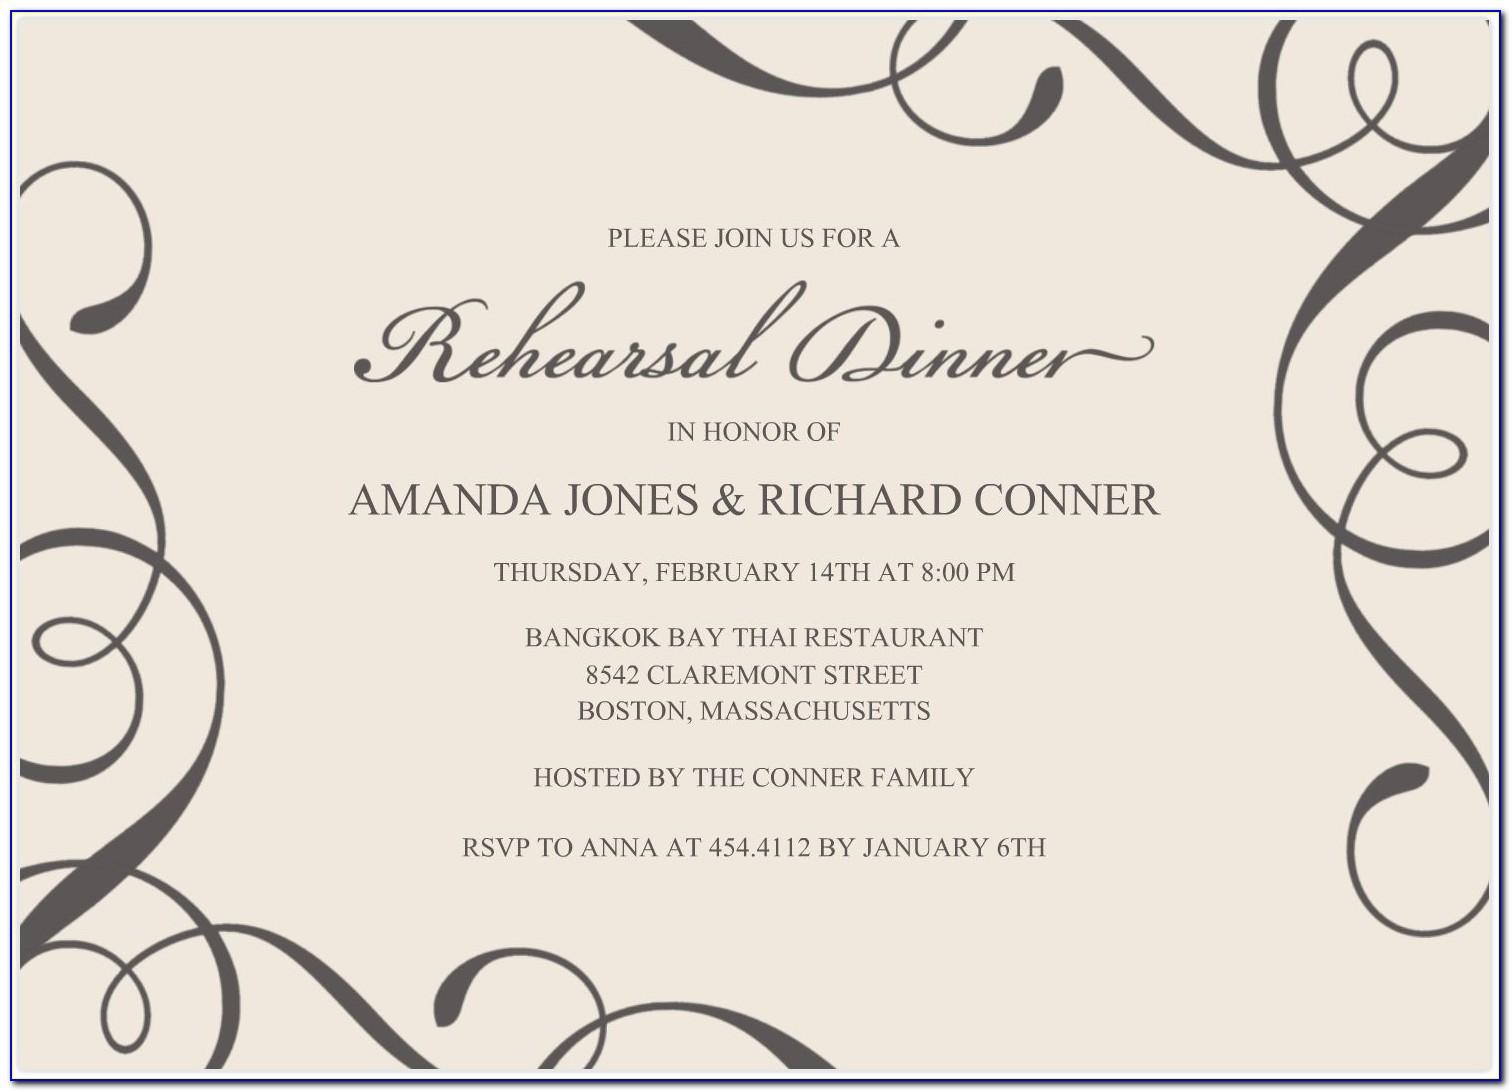 Invitation Card Design Template For Event